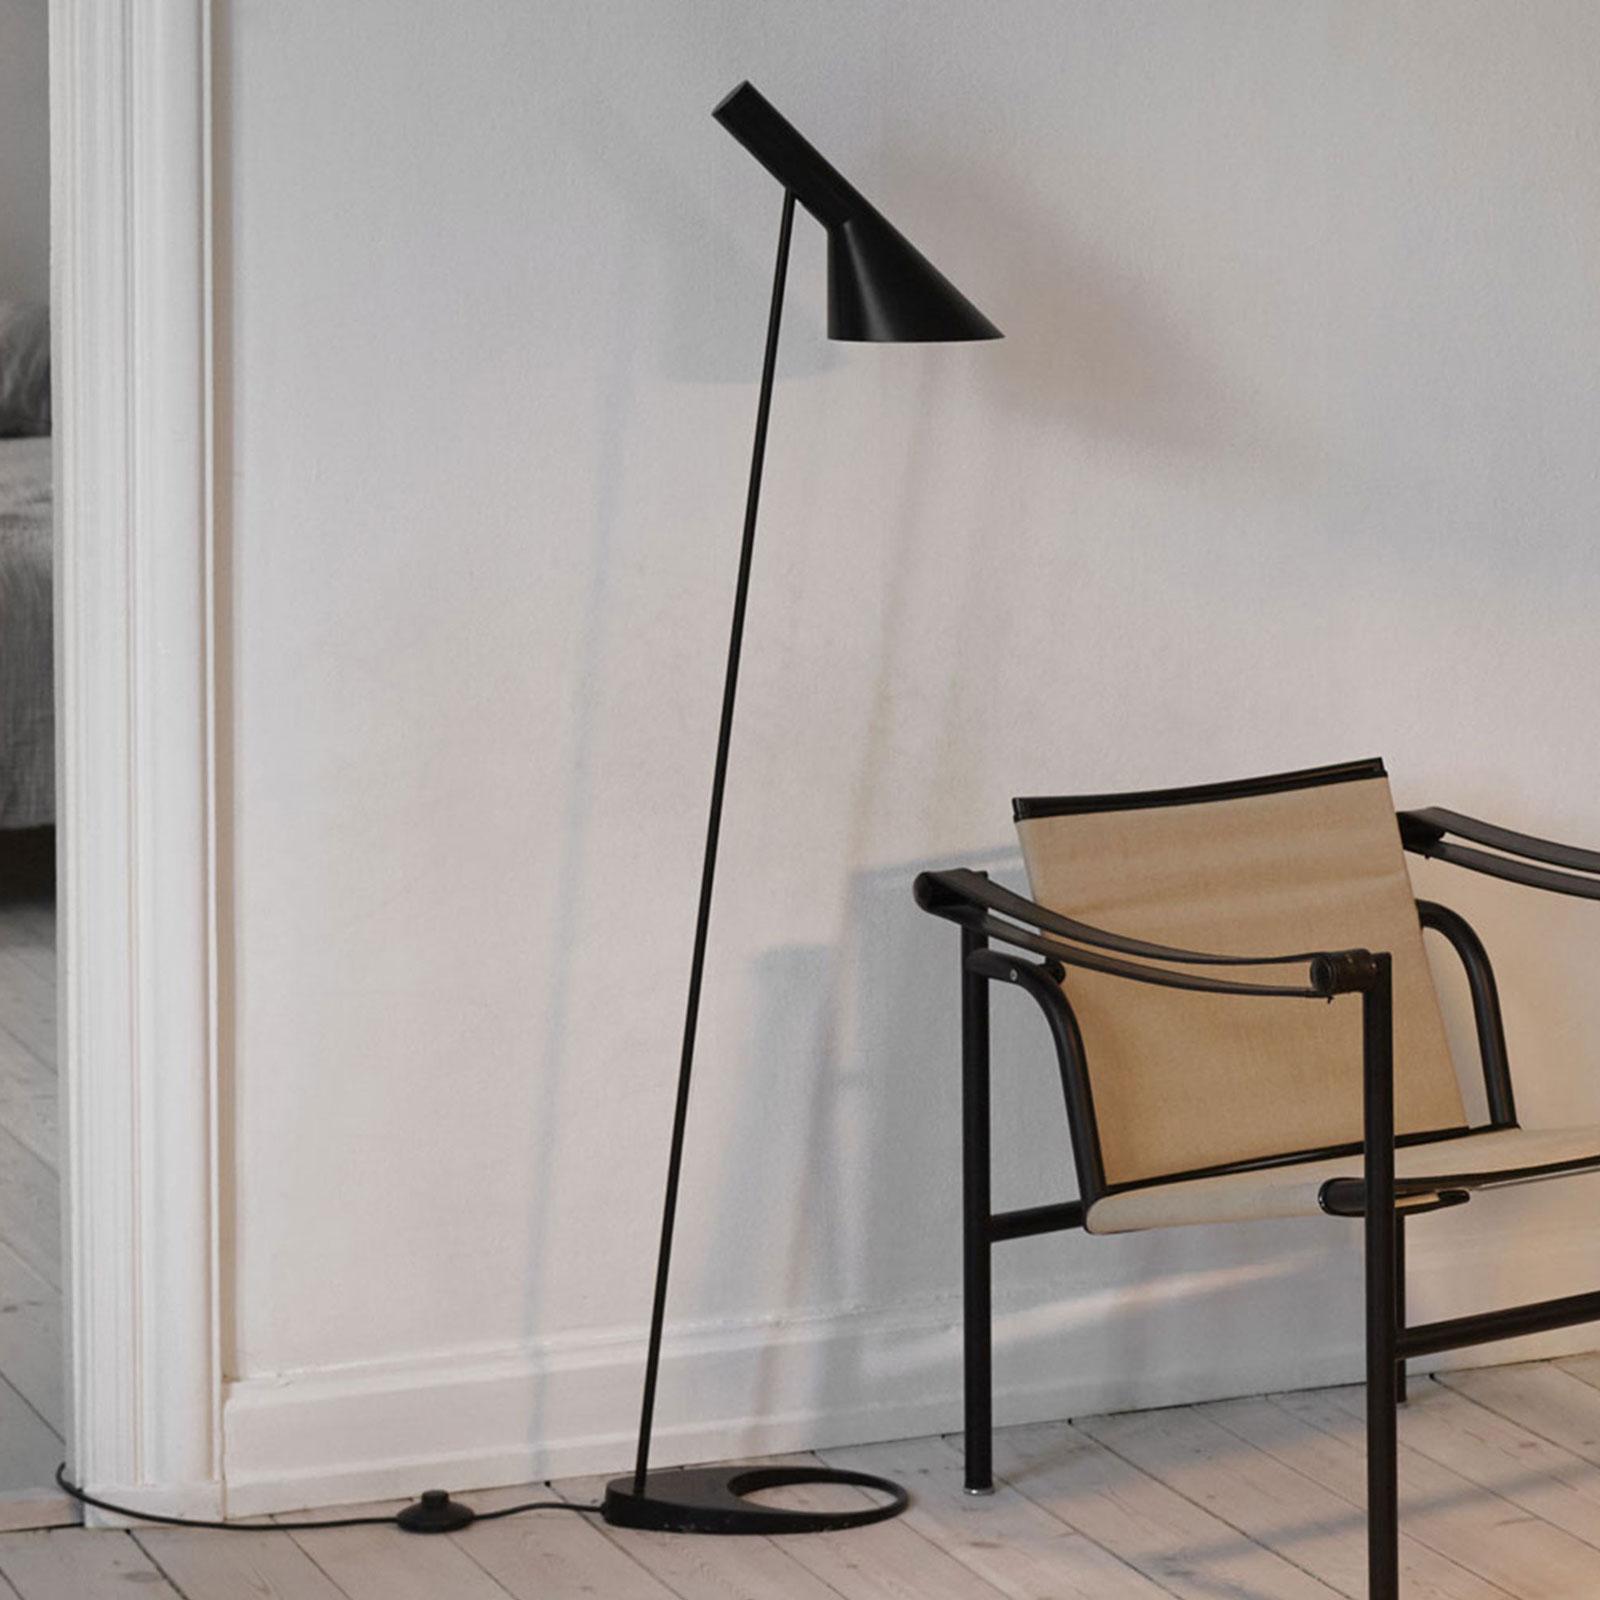 Louis Poulsen AJ - vloerlamp, zwart